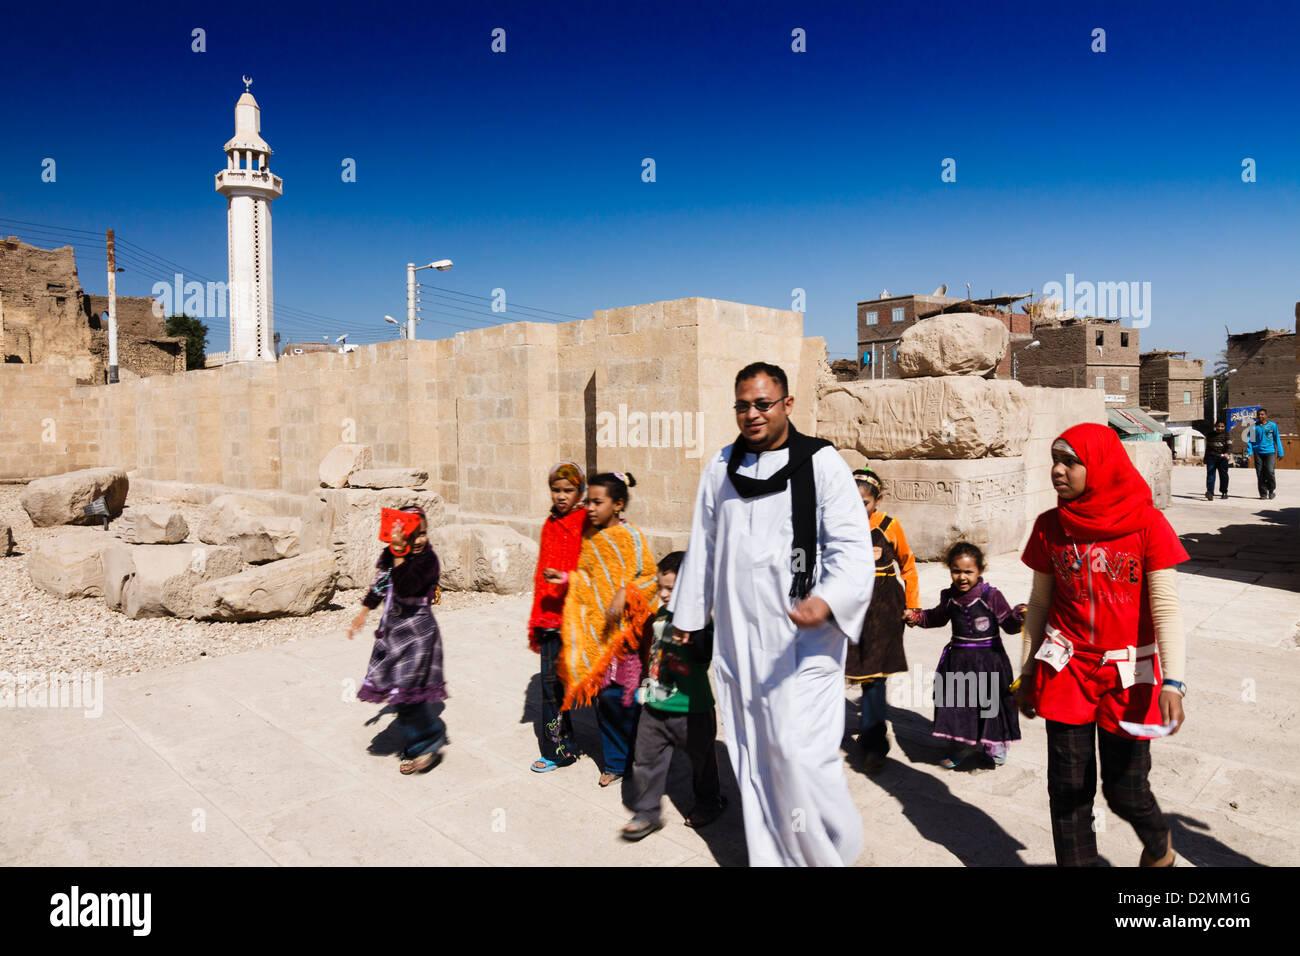 Egyptian teacher guiding a group of schoolchildren into the Abydos temple. Egypt - Stock Image